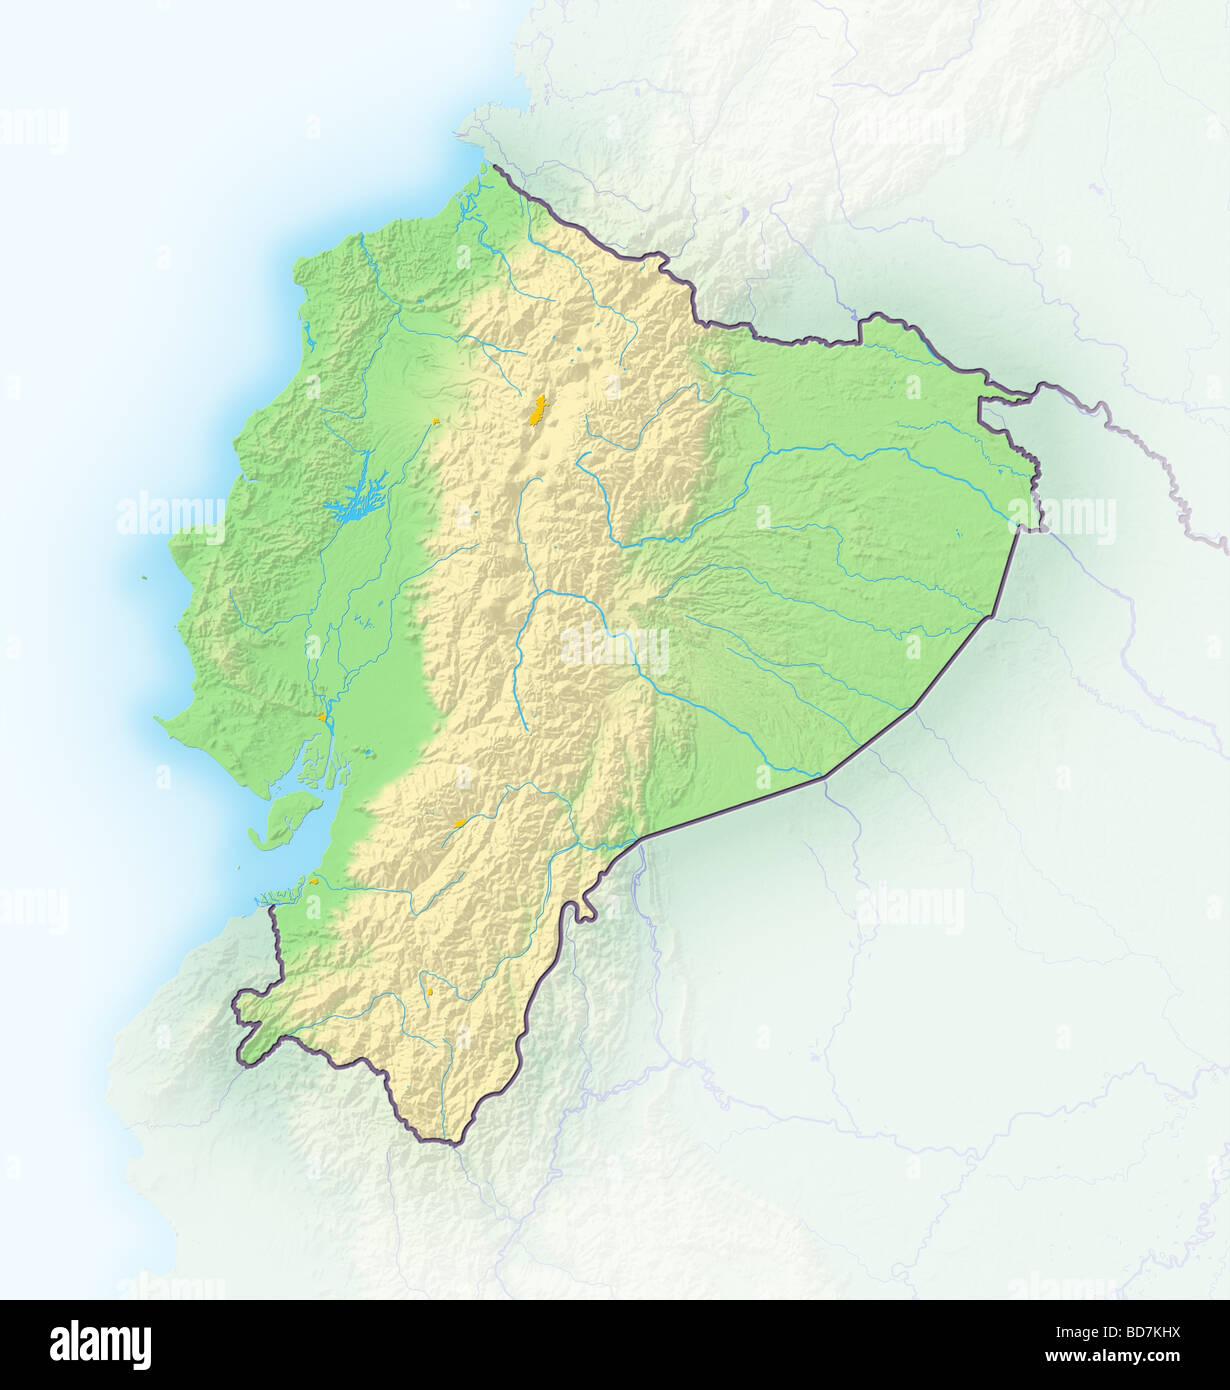 Ecuador Map Stock Photos & Ecuador Map Stock Images - Alamy